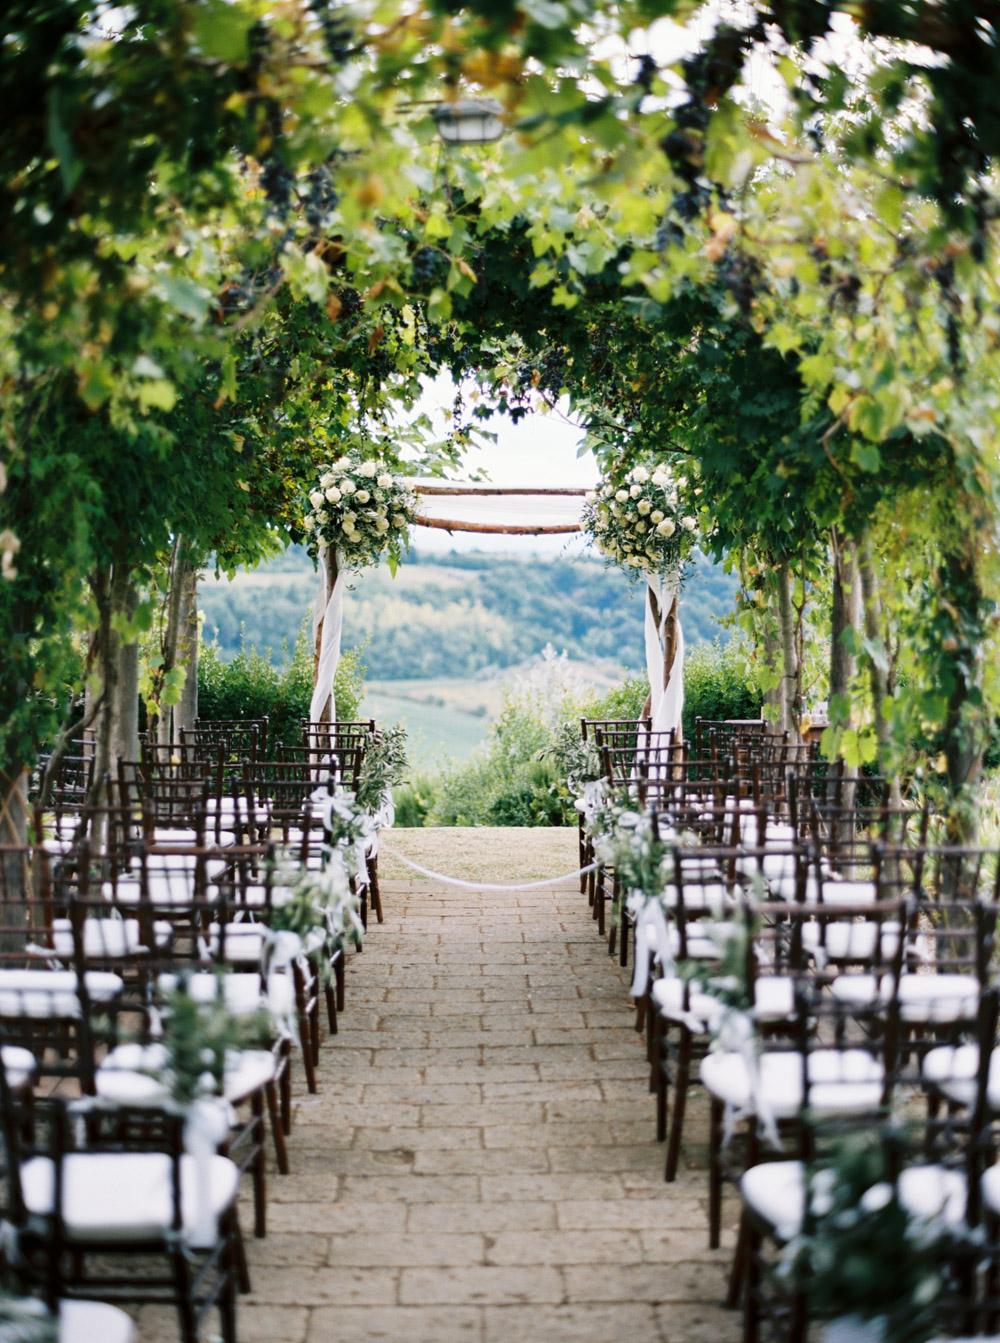 ceremony setting in a romantic wedding venue